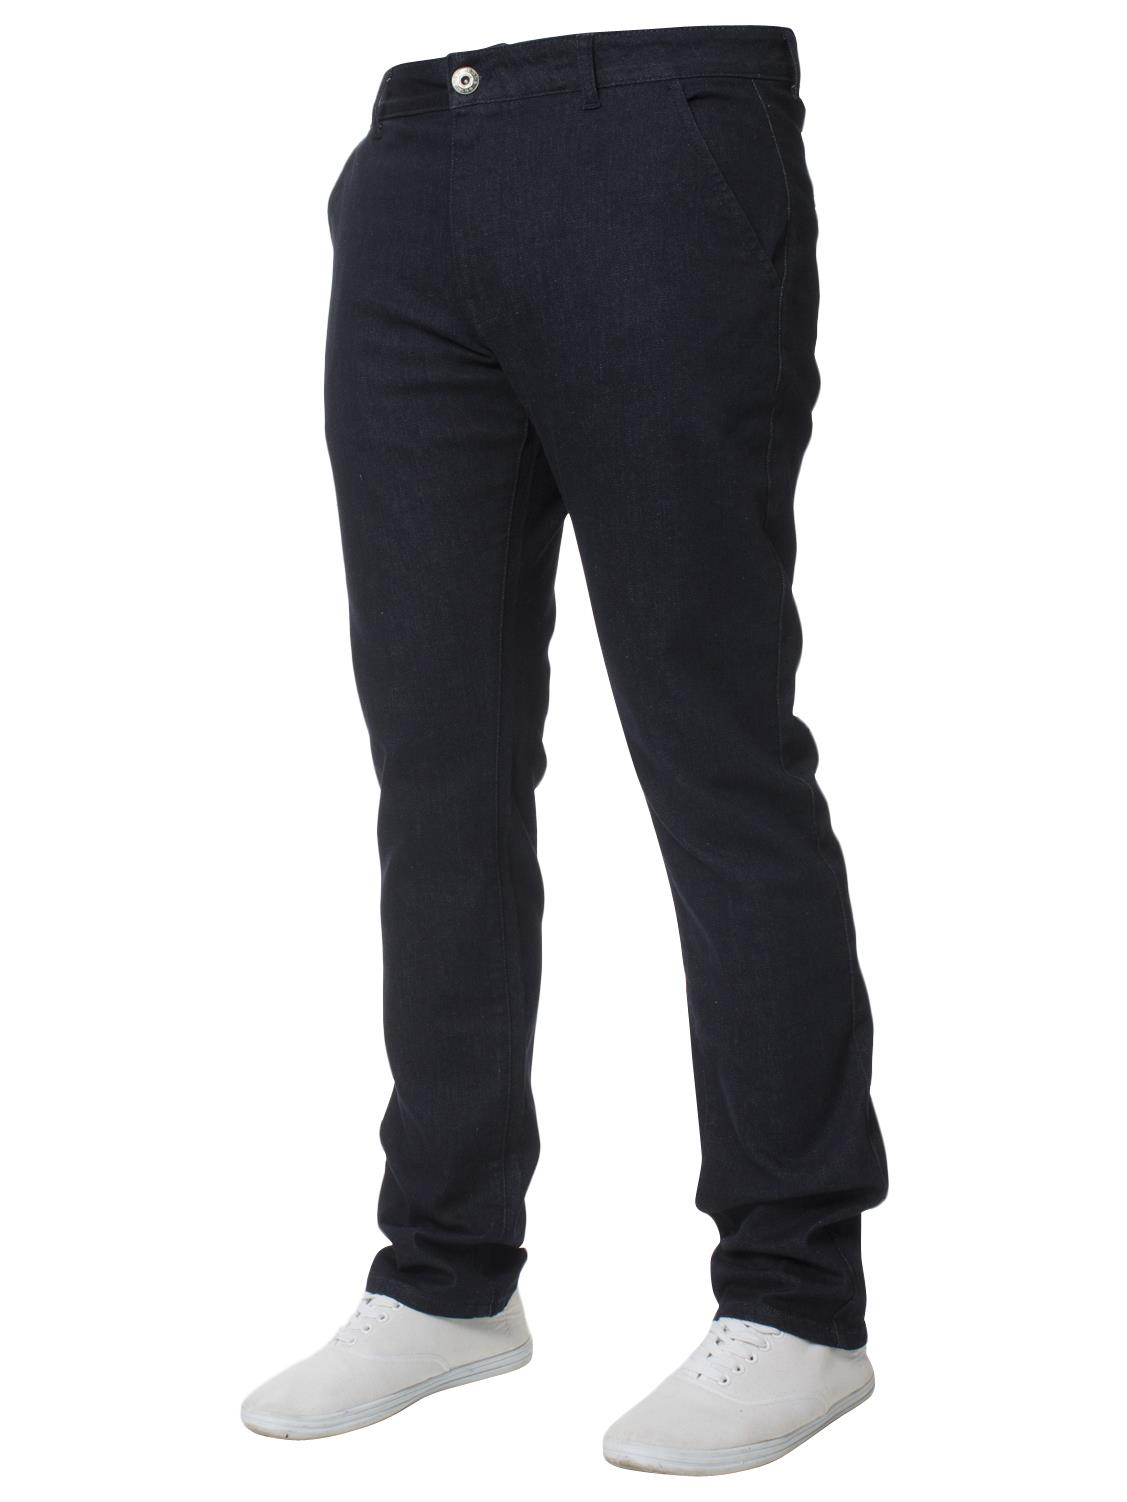 ENZO-Jeans-para-hombre-Big-Alto-Pierna-King-Size-Jeans-Pantalones-Chino-Pantalones-Pantalones-44-034 miniatura 30